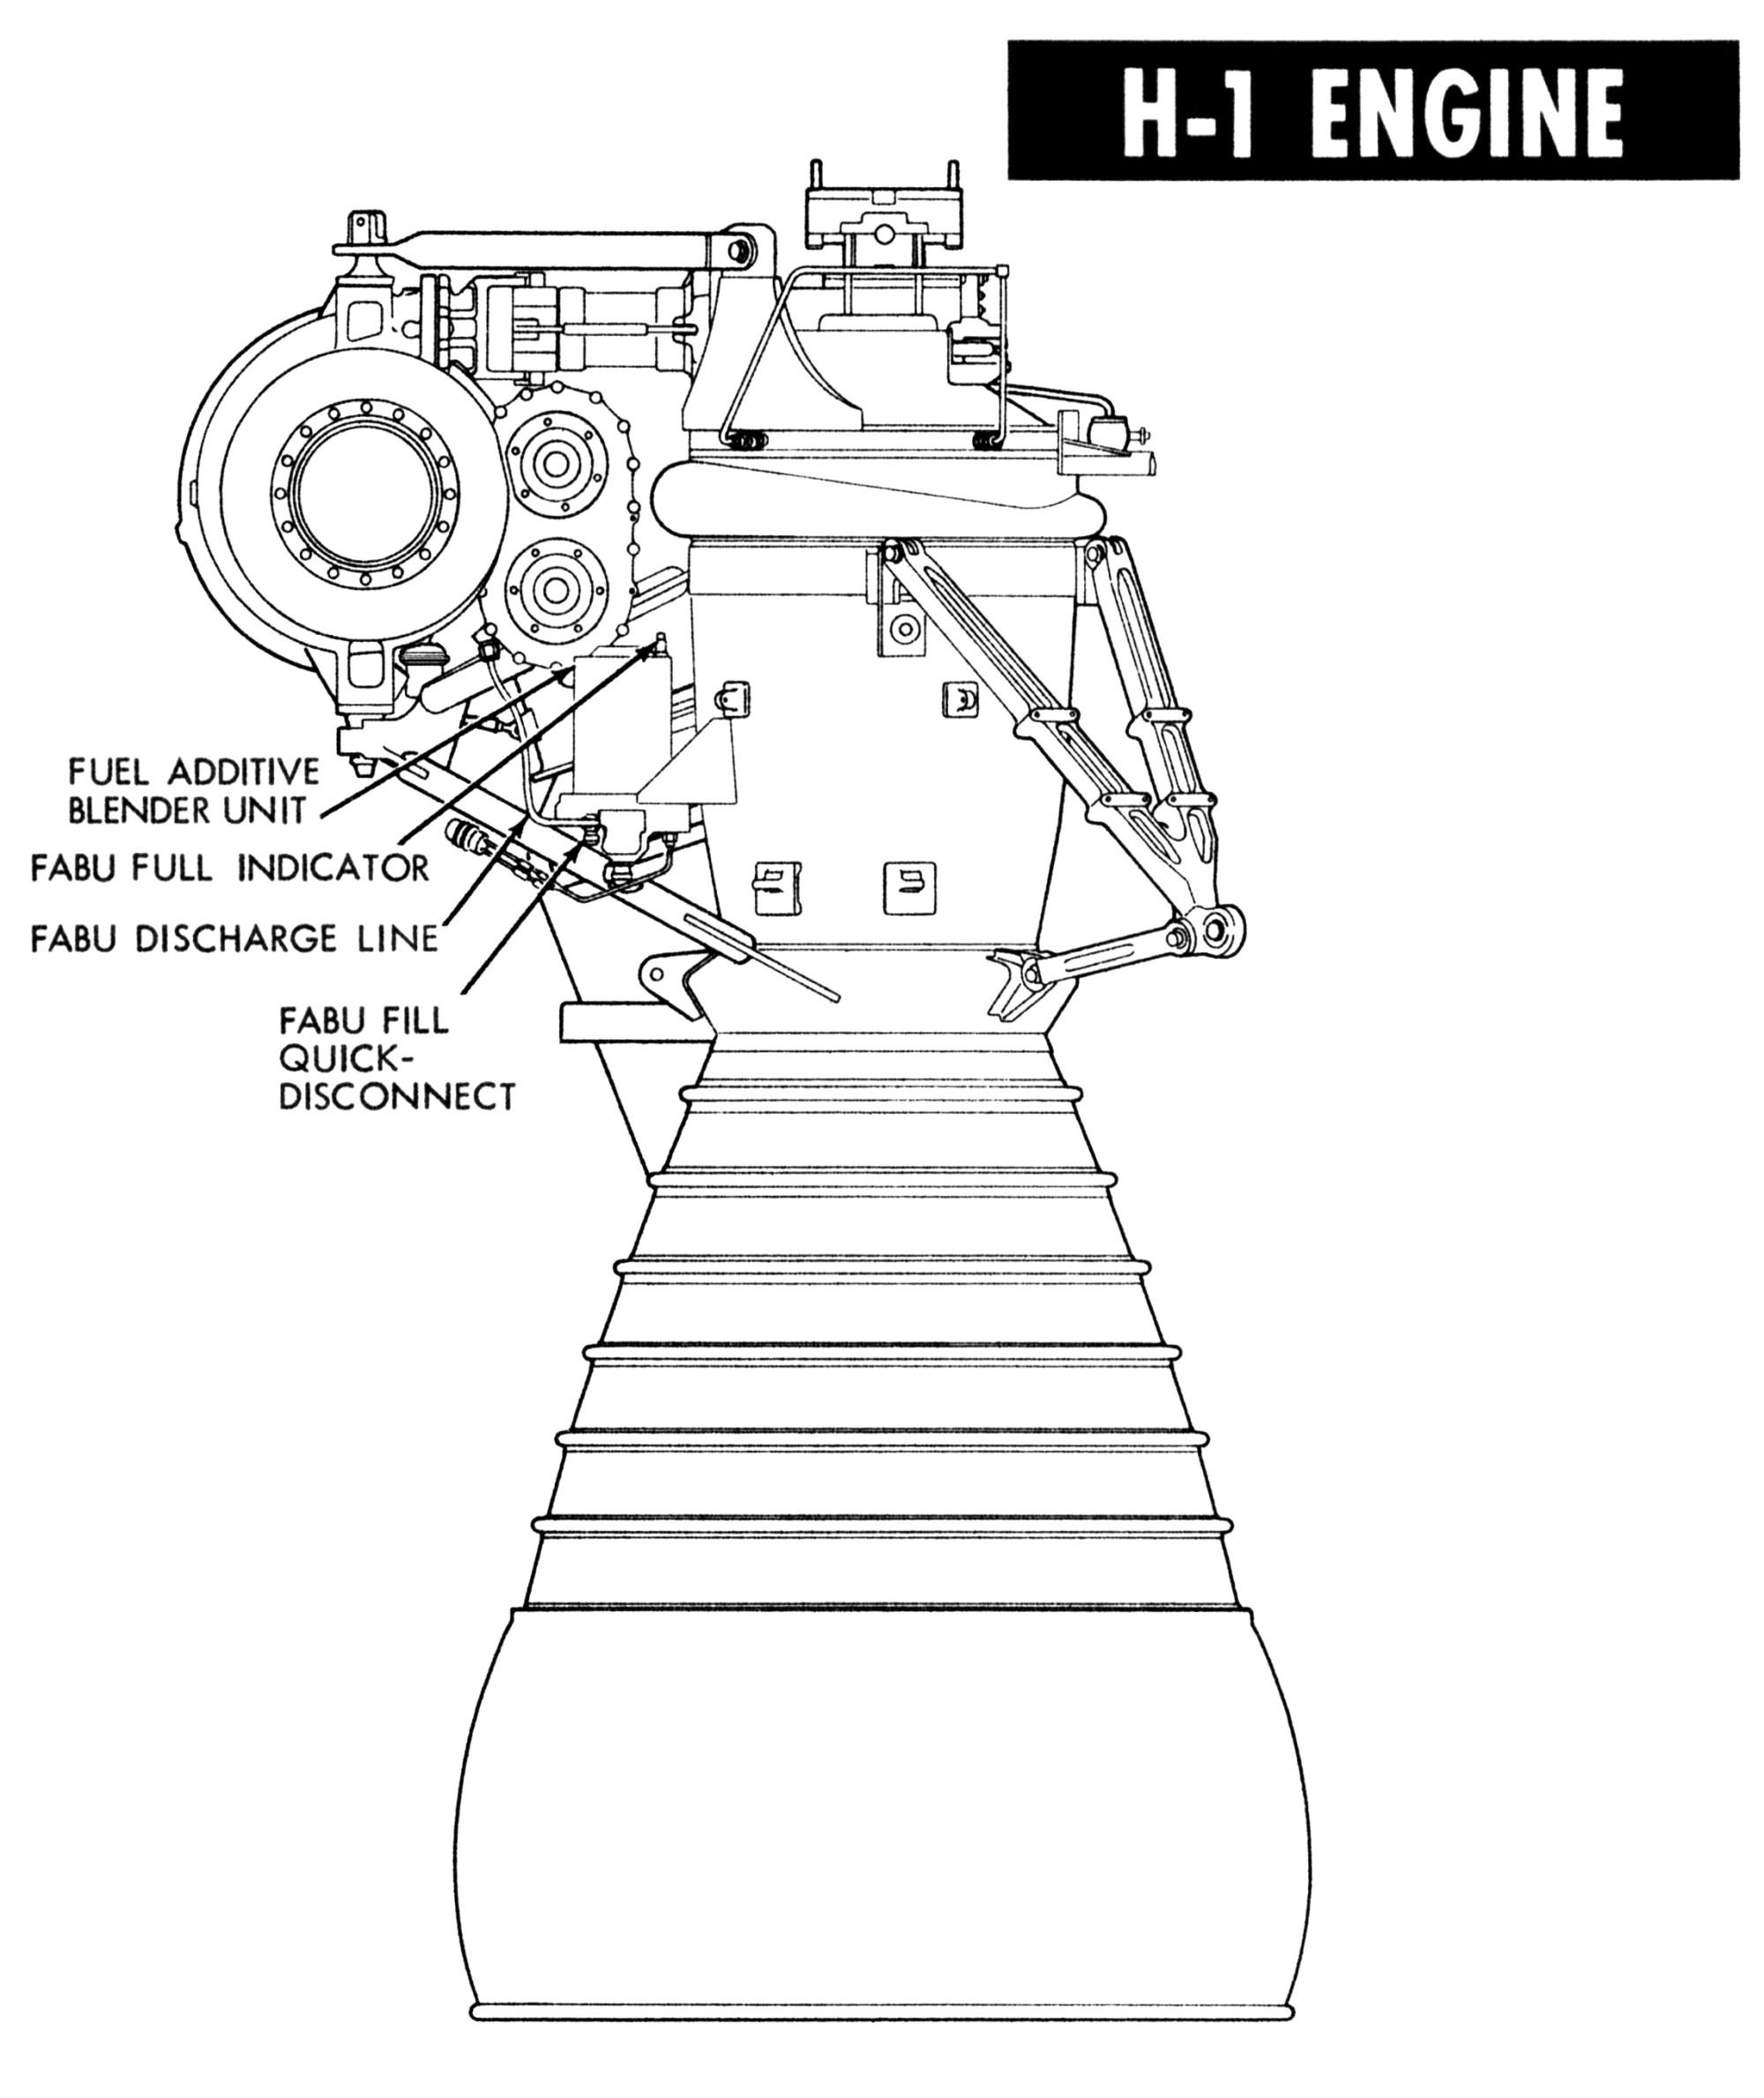 hight resolution of 49cc pocket bike engine diagram html imageresizertool com